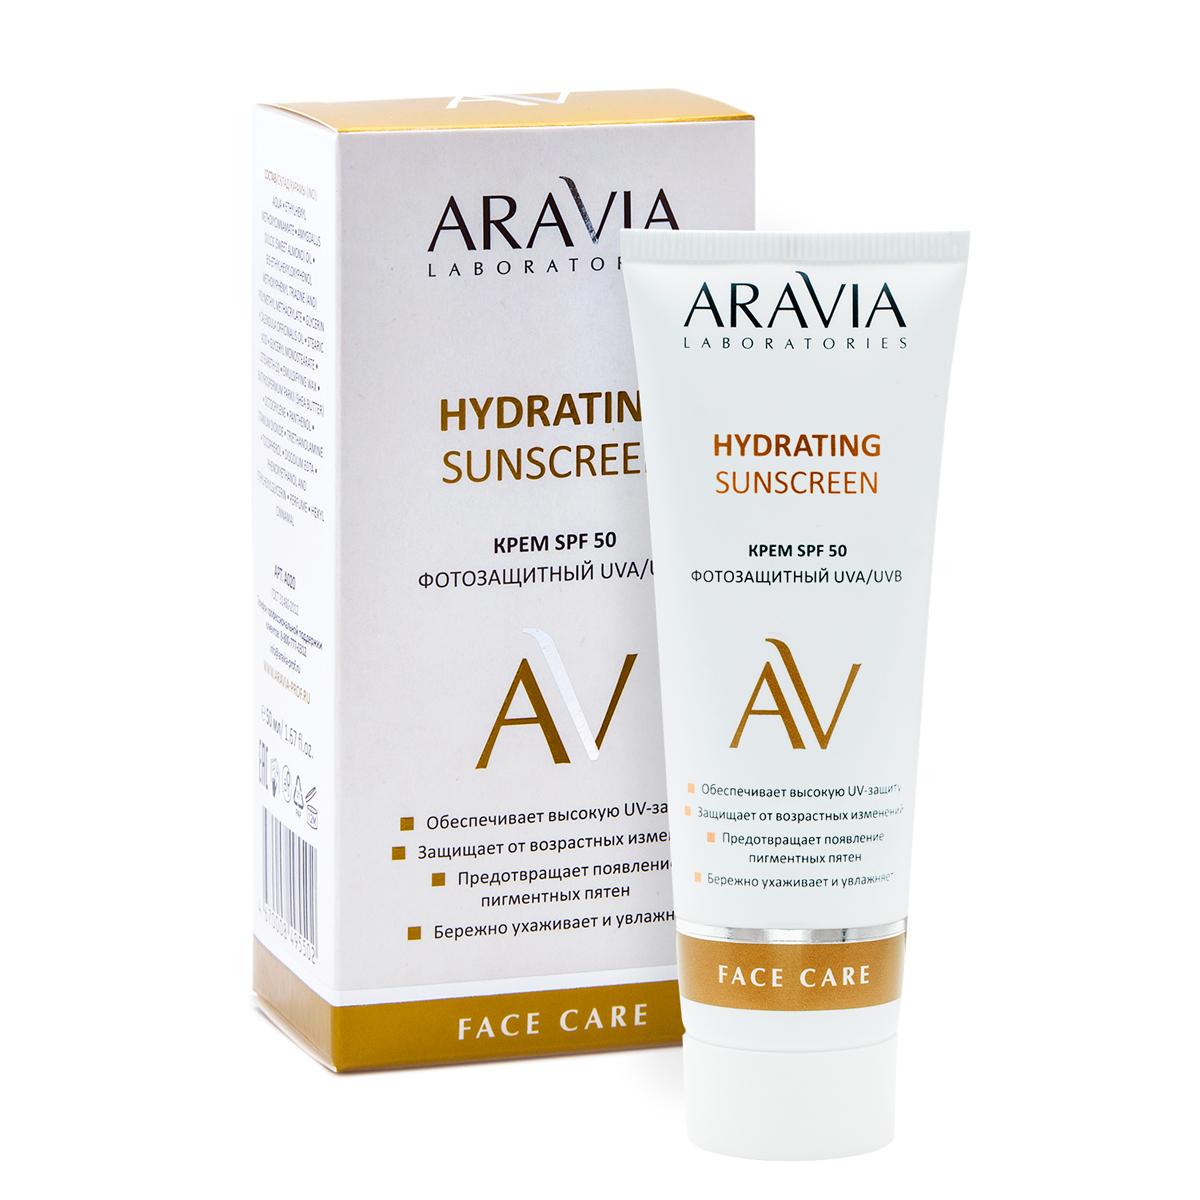 Aravia Laboratories Крем дневной фотозащитный SPF 50 Hydrating Sunscreen, 50 мл (Aravia Laboratories, Уход за лицом)